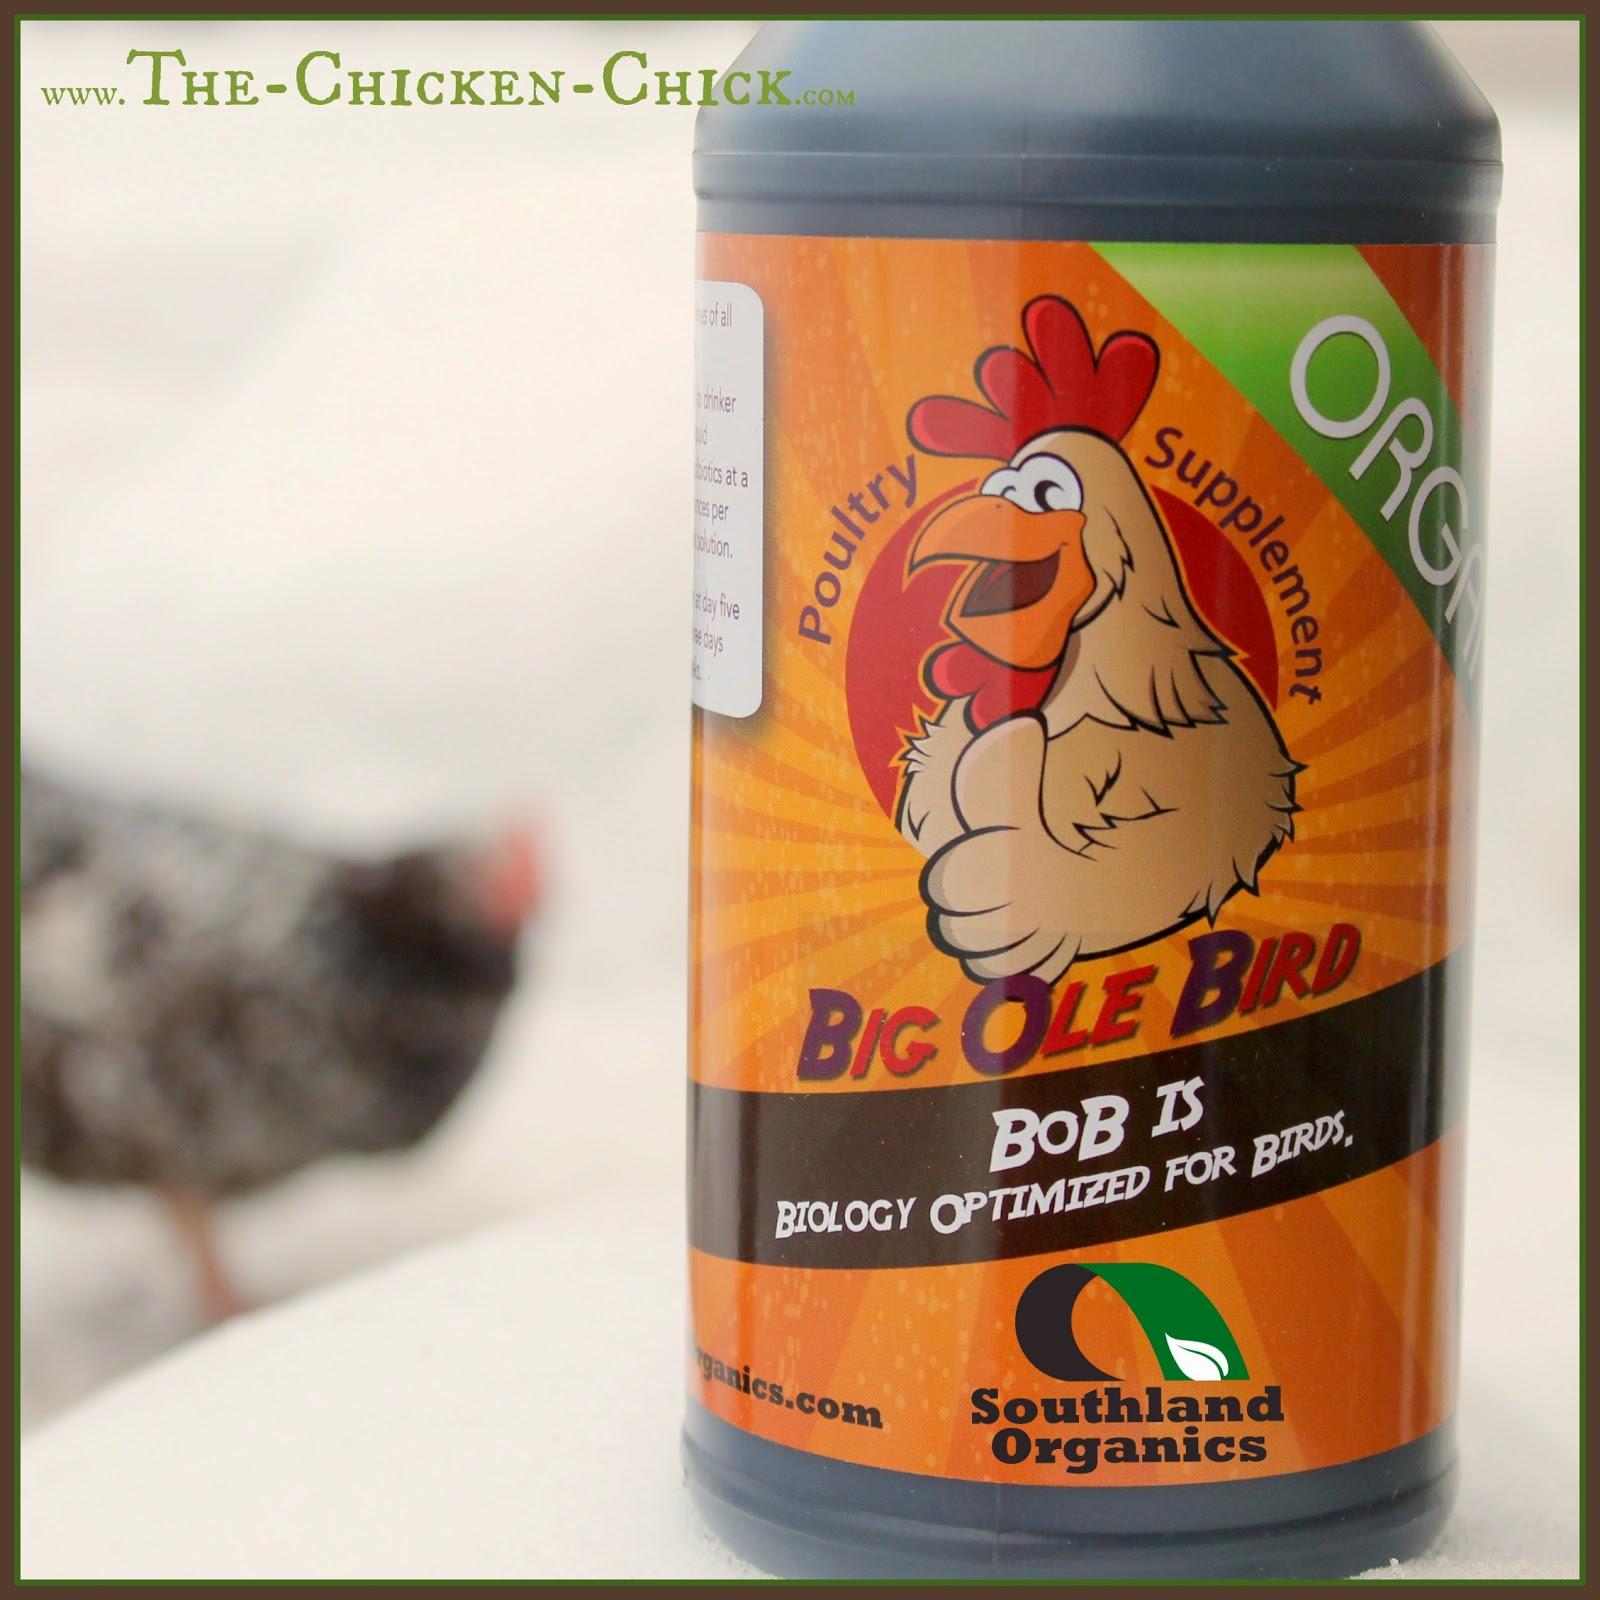 Big Ole Bird Probiotics